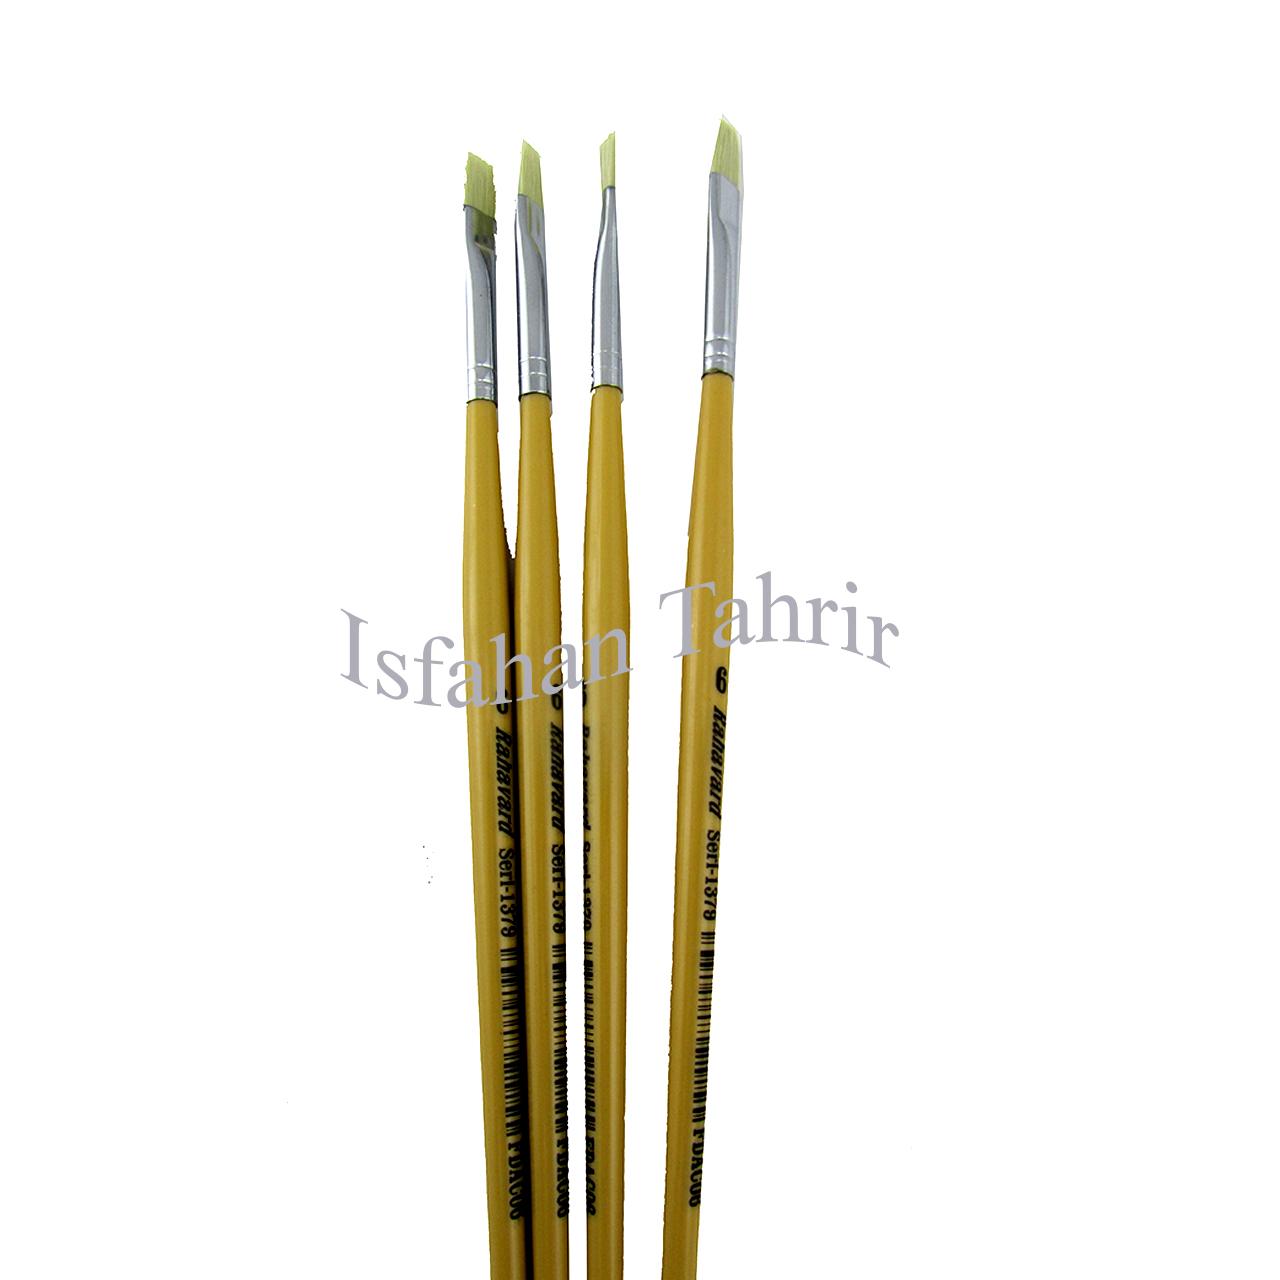 قلم مو رهاورد سرتخت سایز 6